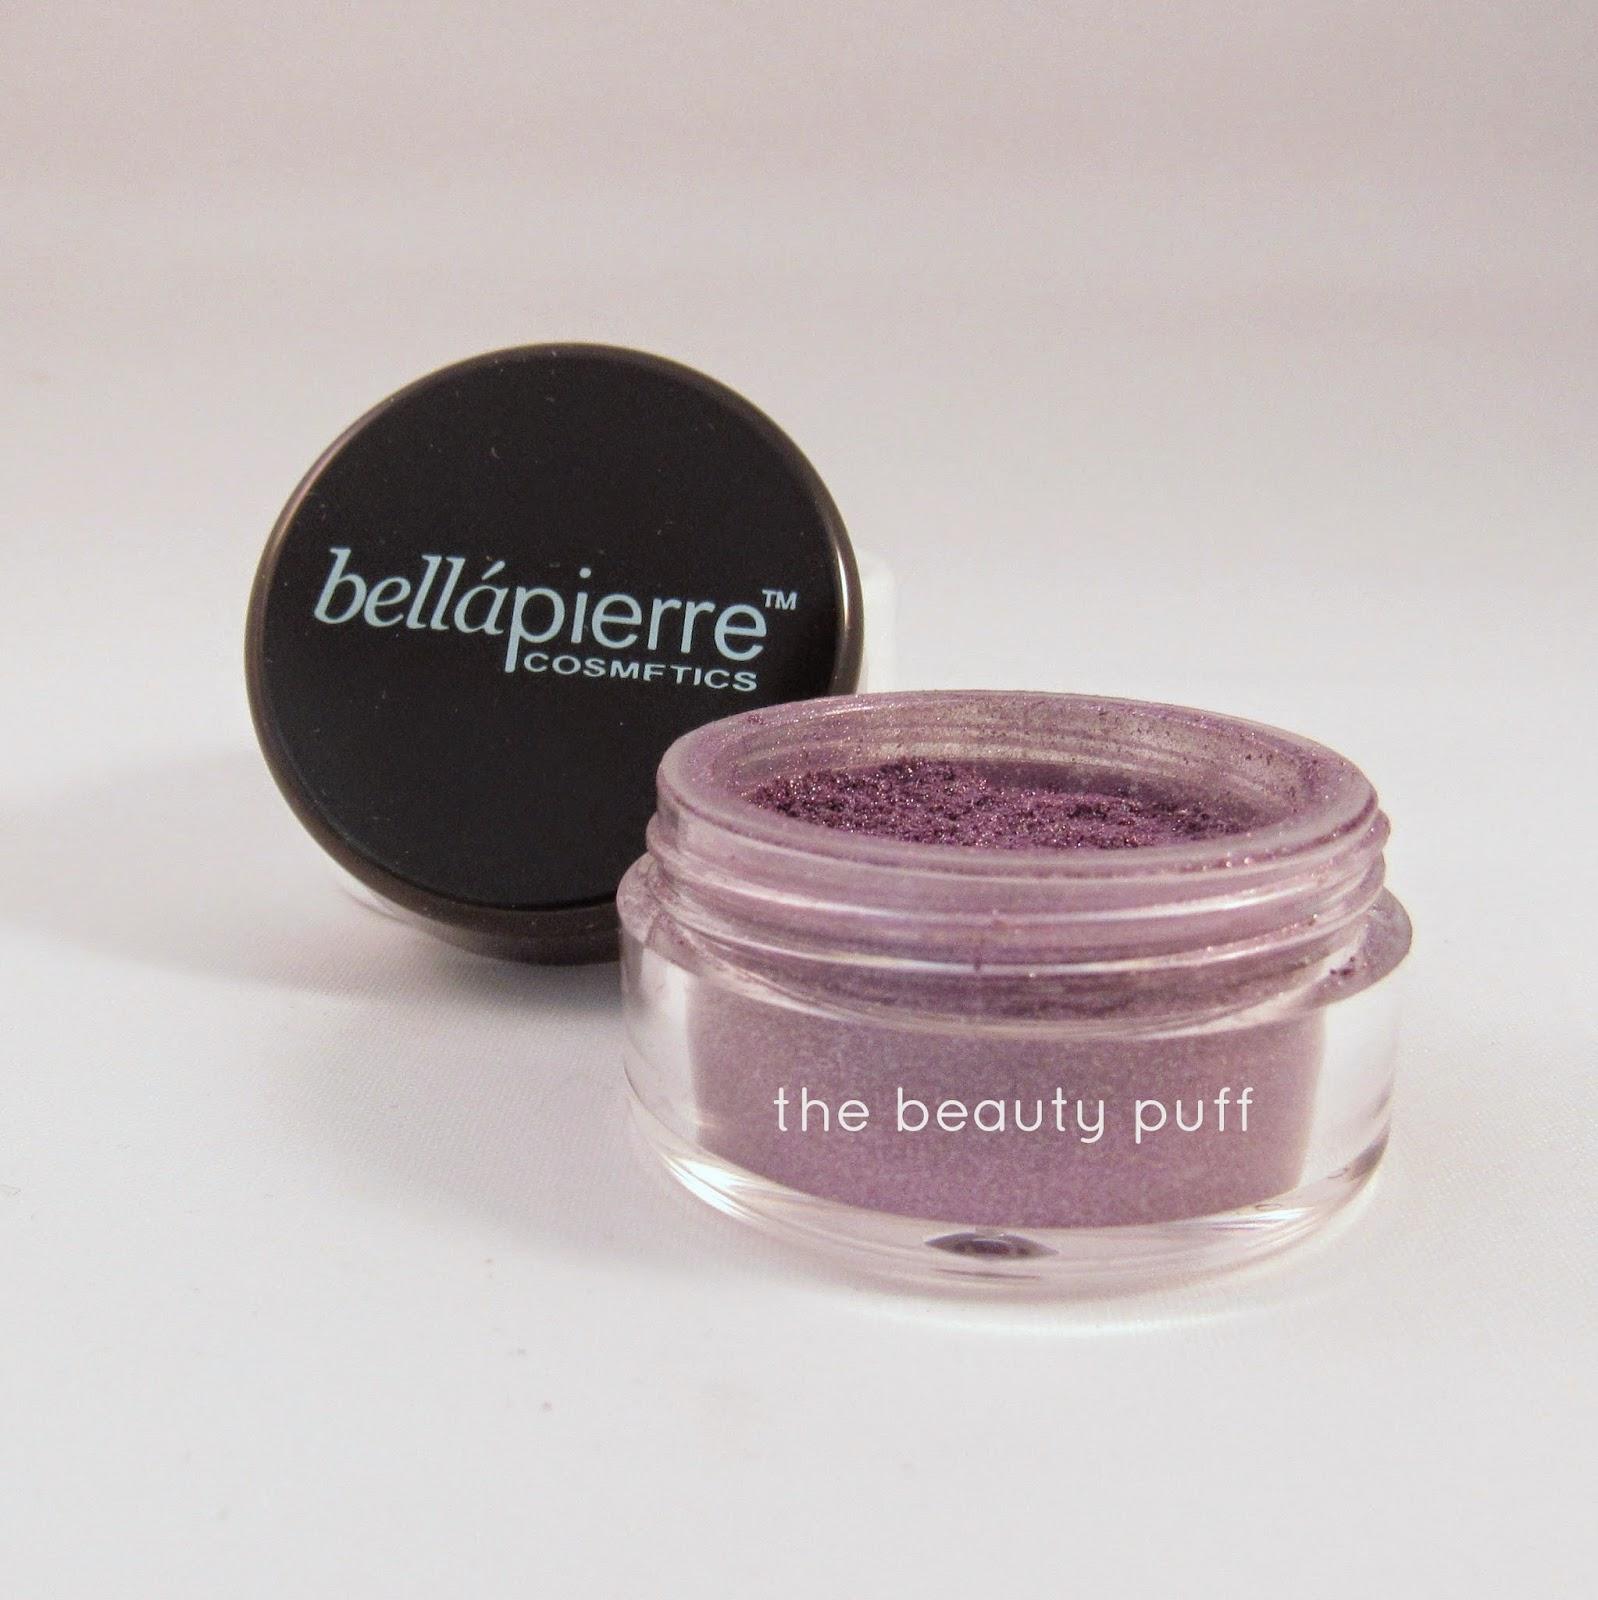 bellapierre hurly burly - the beauty puff